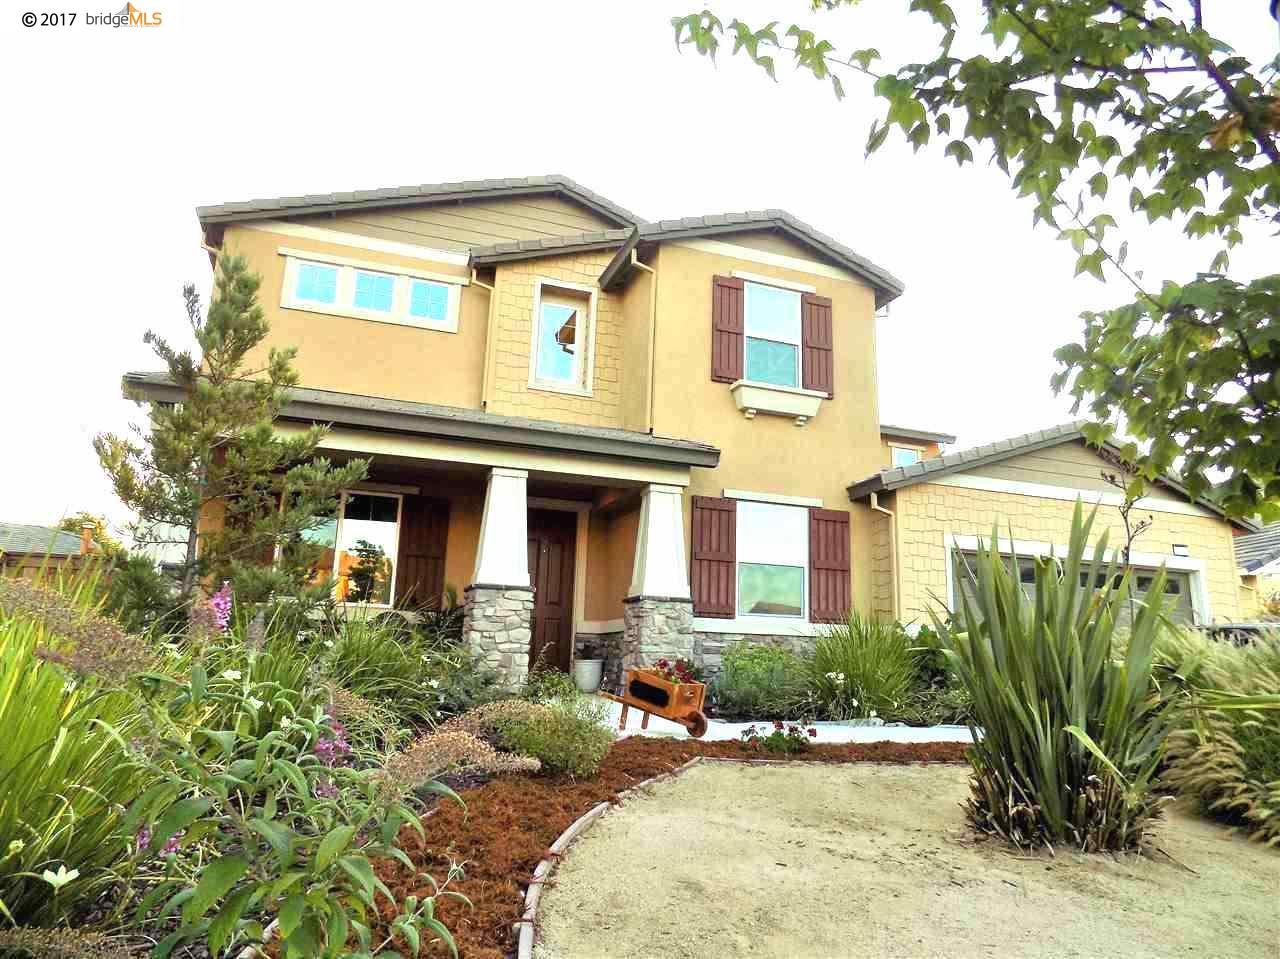 105 Muir Ct, OAKLEY, CA 94561